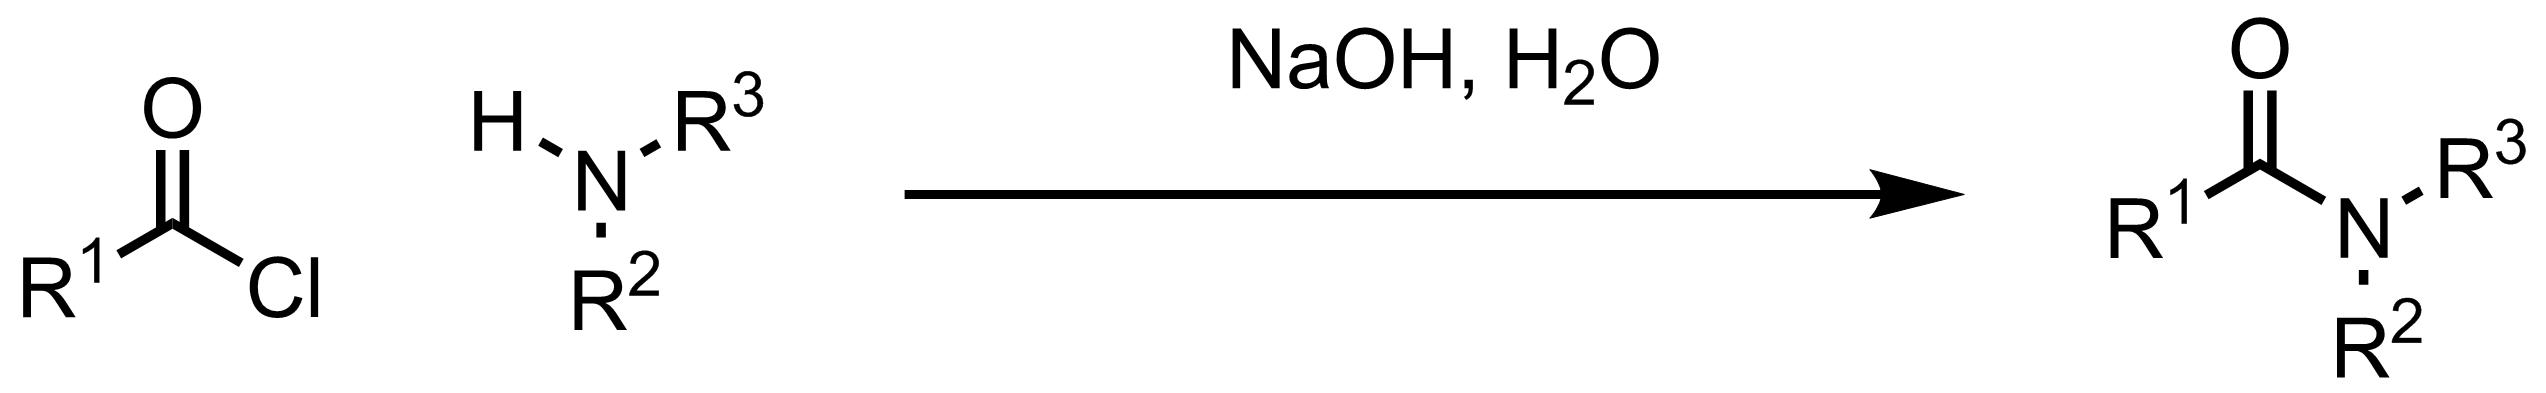 Schematic representation of the Schotten-Baumann Reaction.